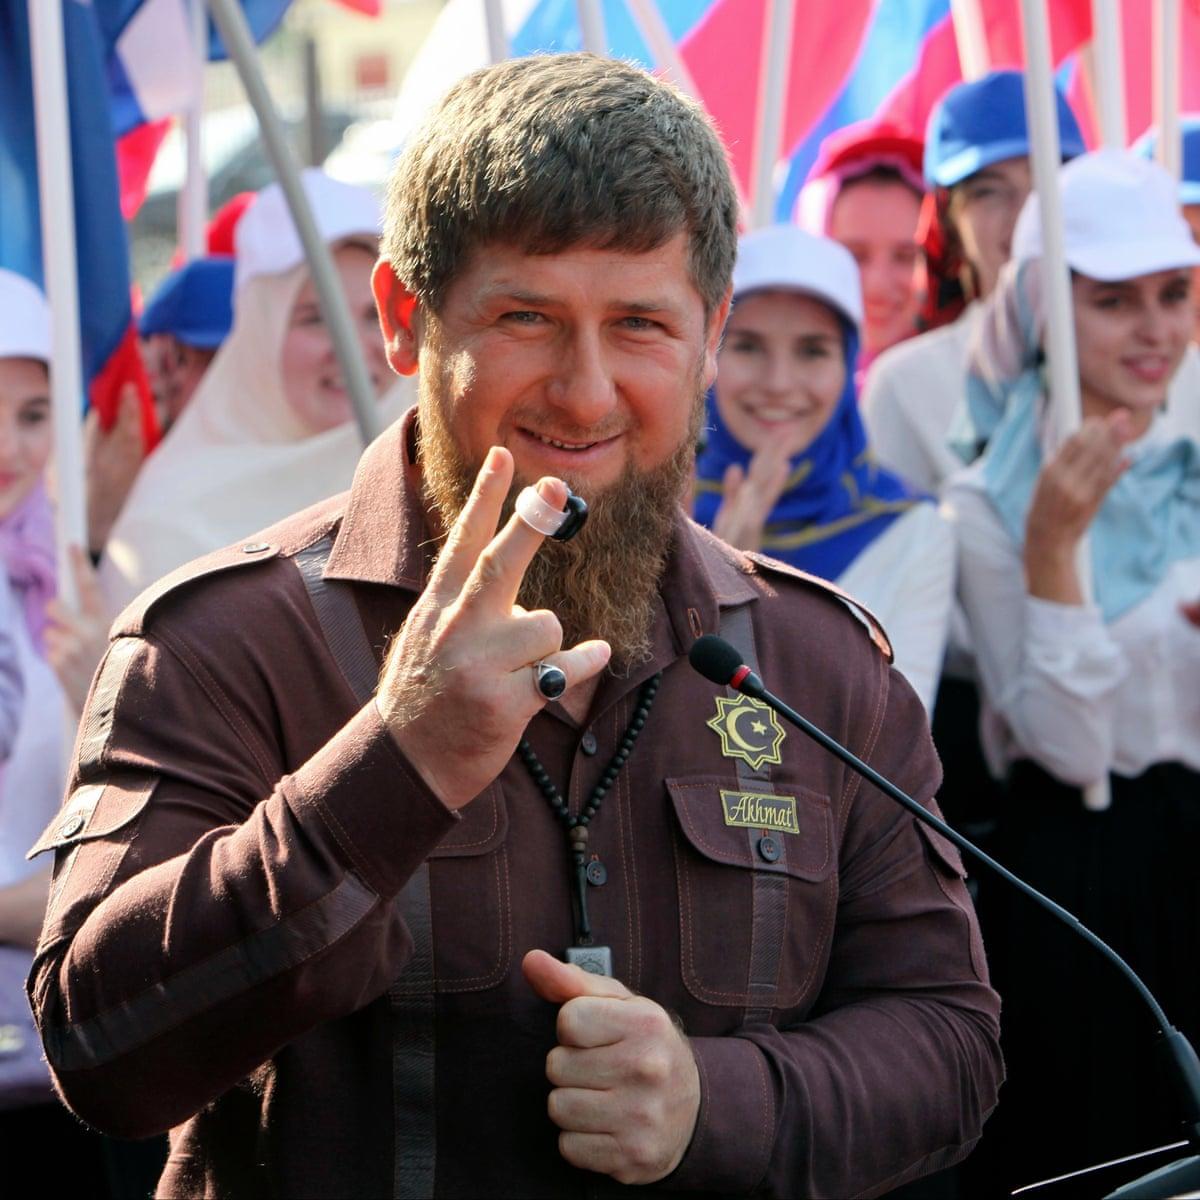 Girl chechnya muslim Russian Muslims